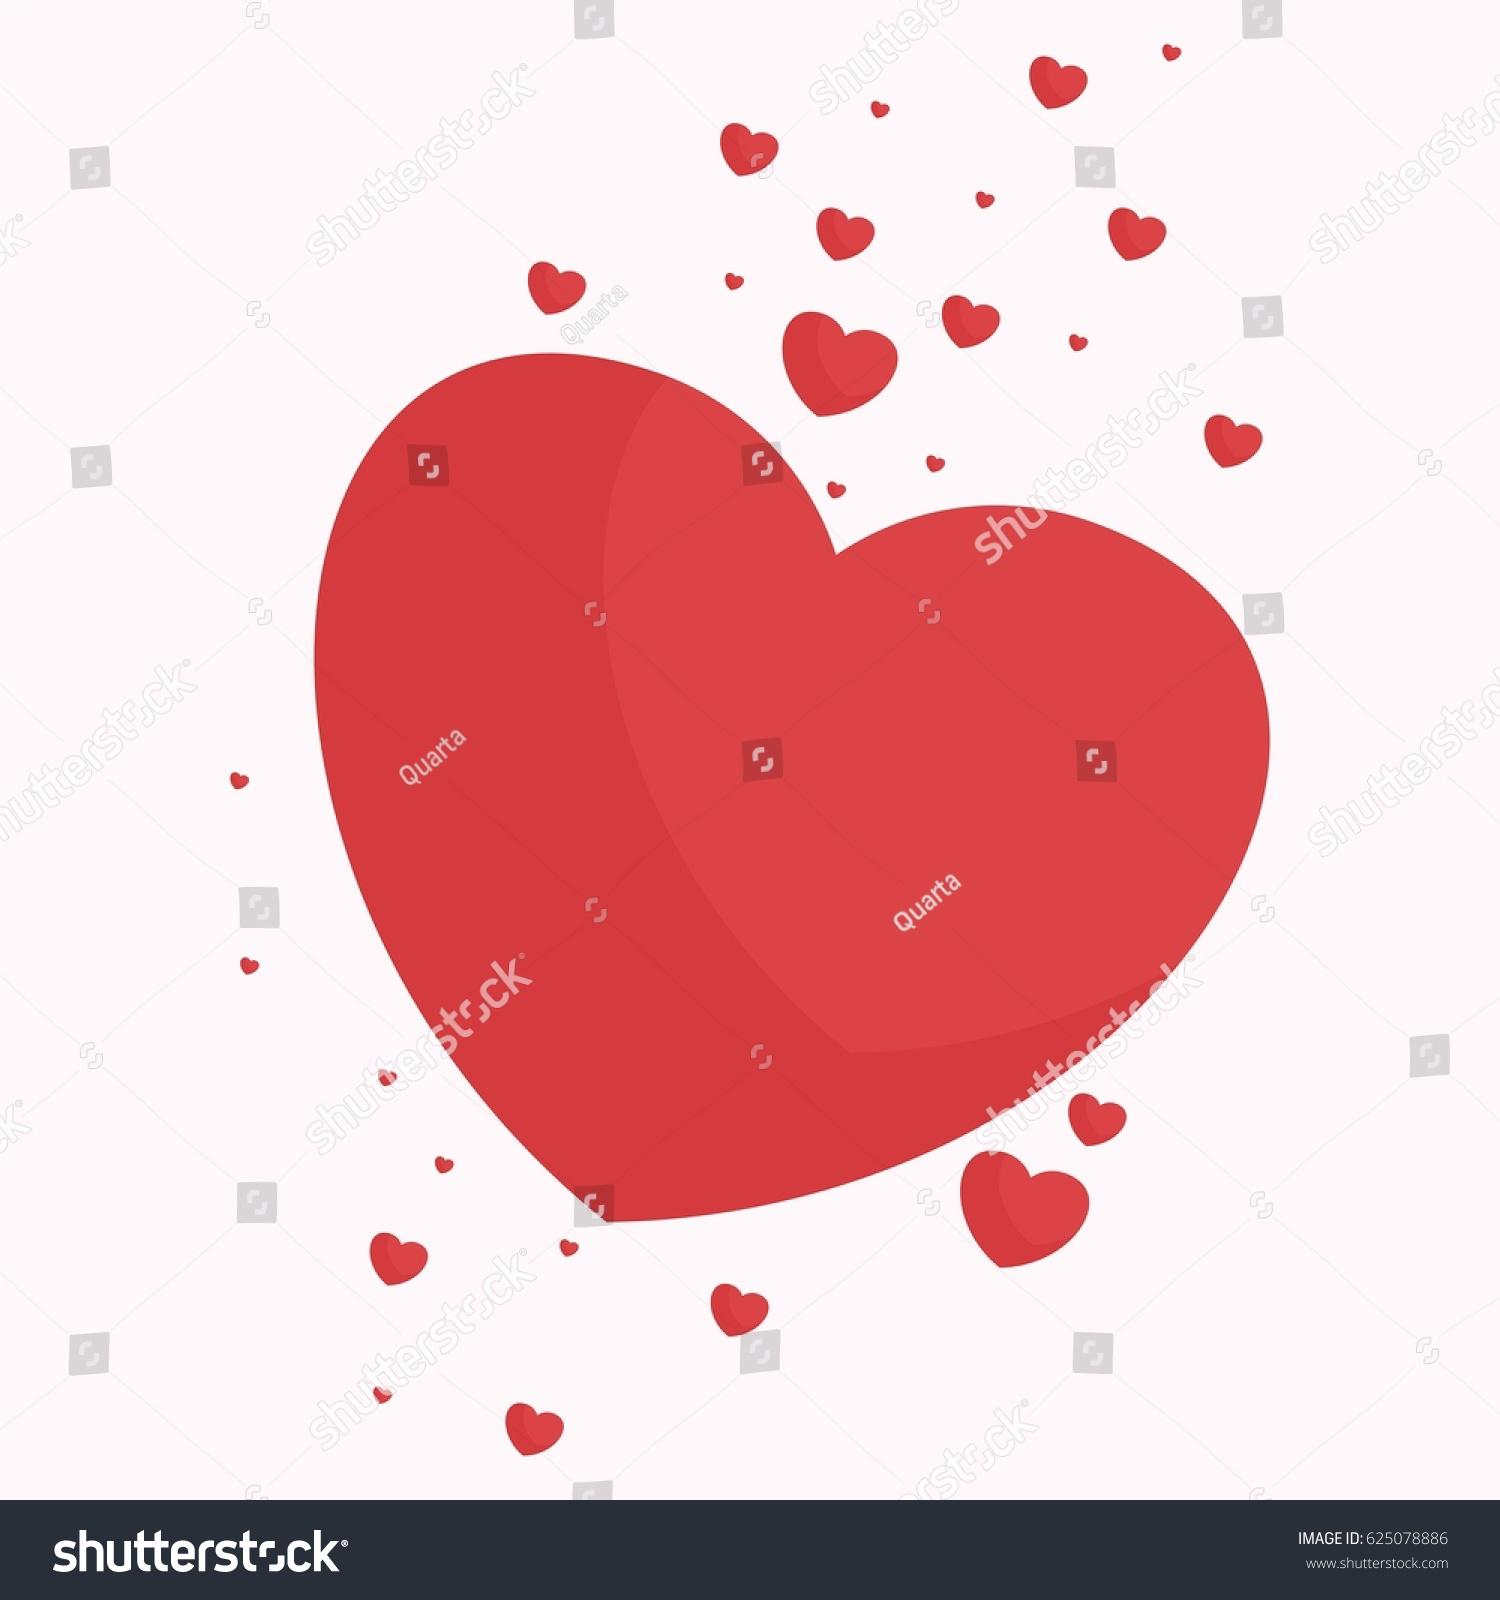 Love Heart Explosion Feelings Emotions Flow Stock Vector Royalty